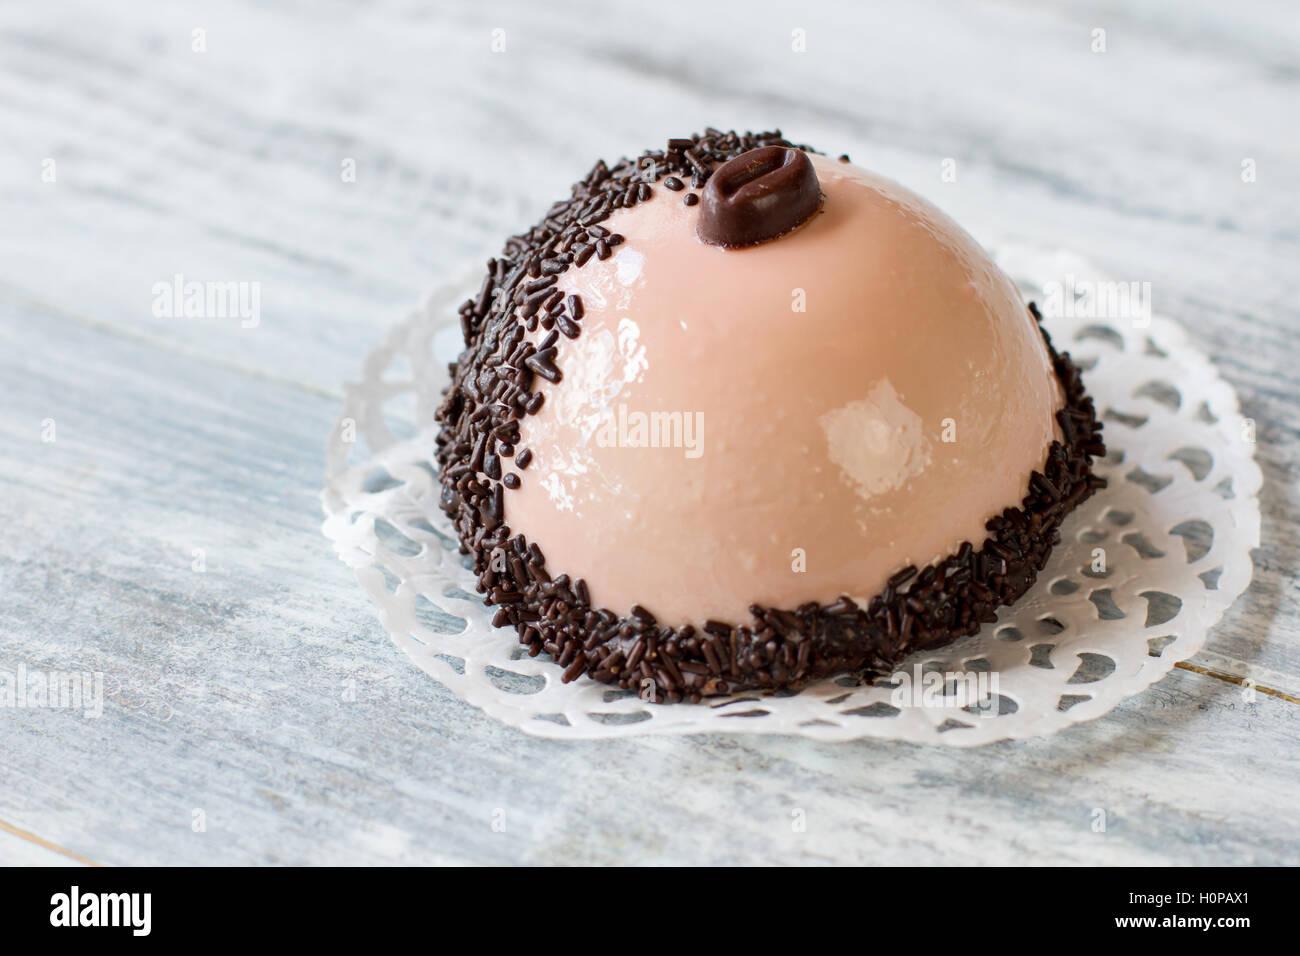 Half sphere dessert with icing. - Stock Image